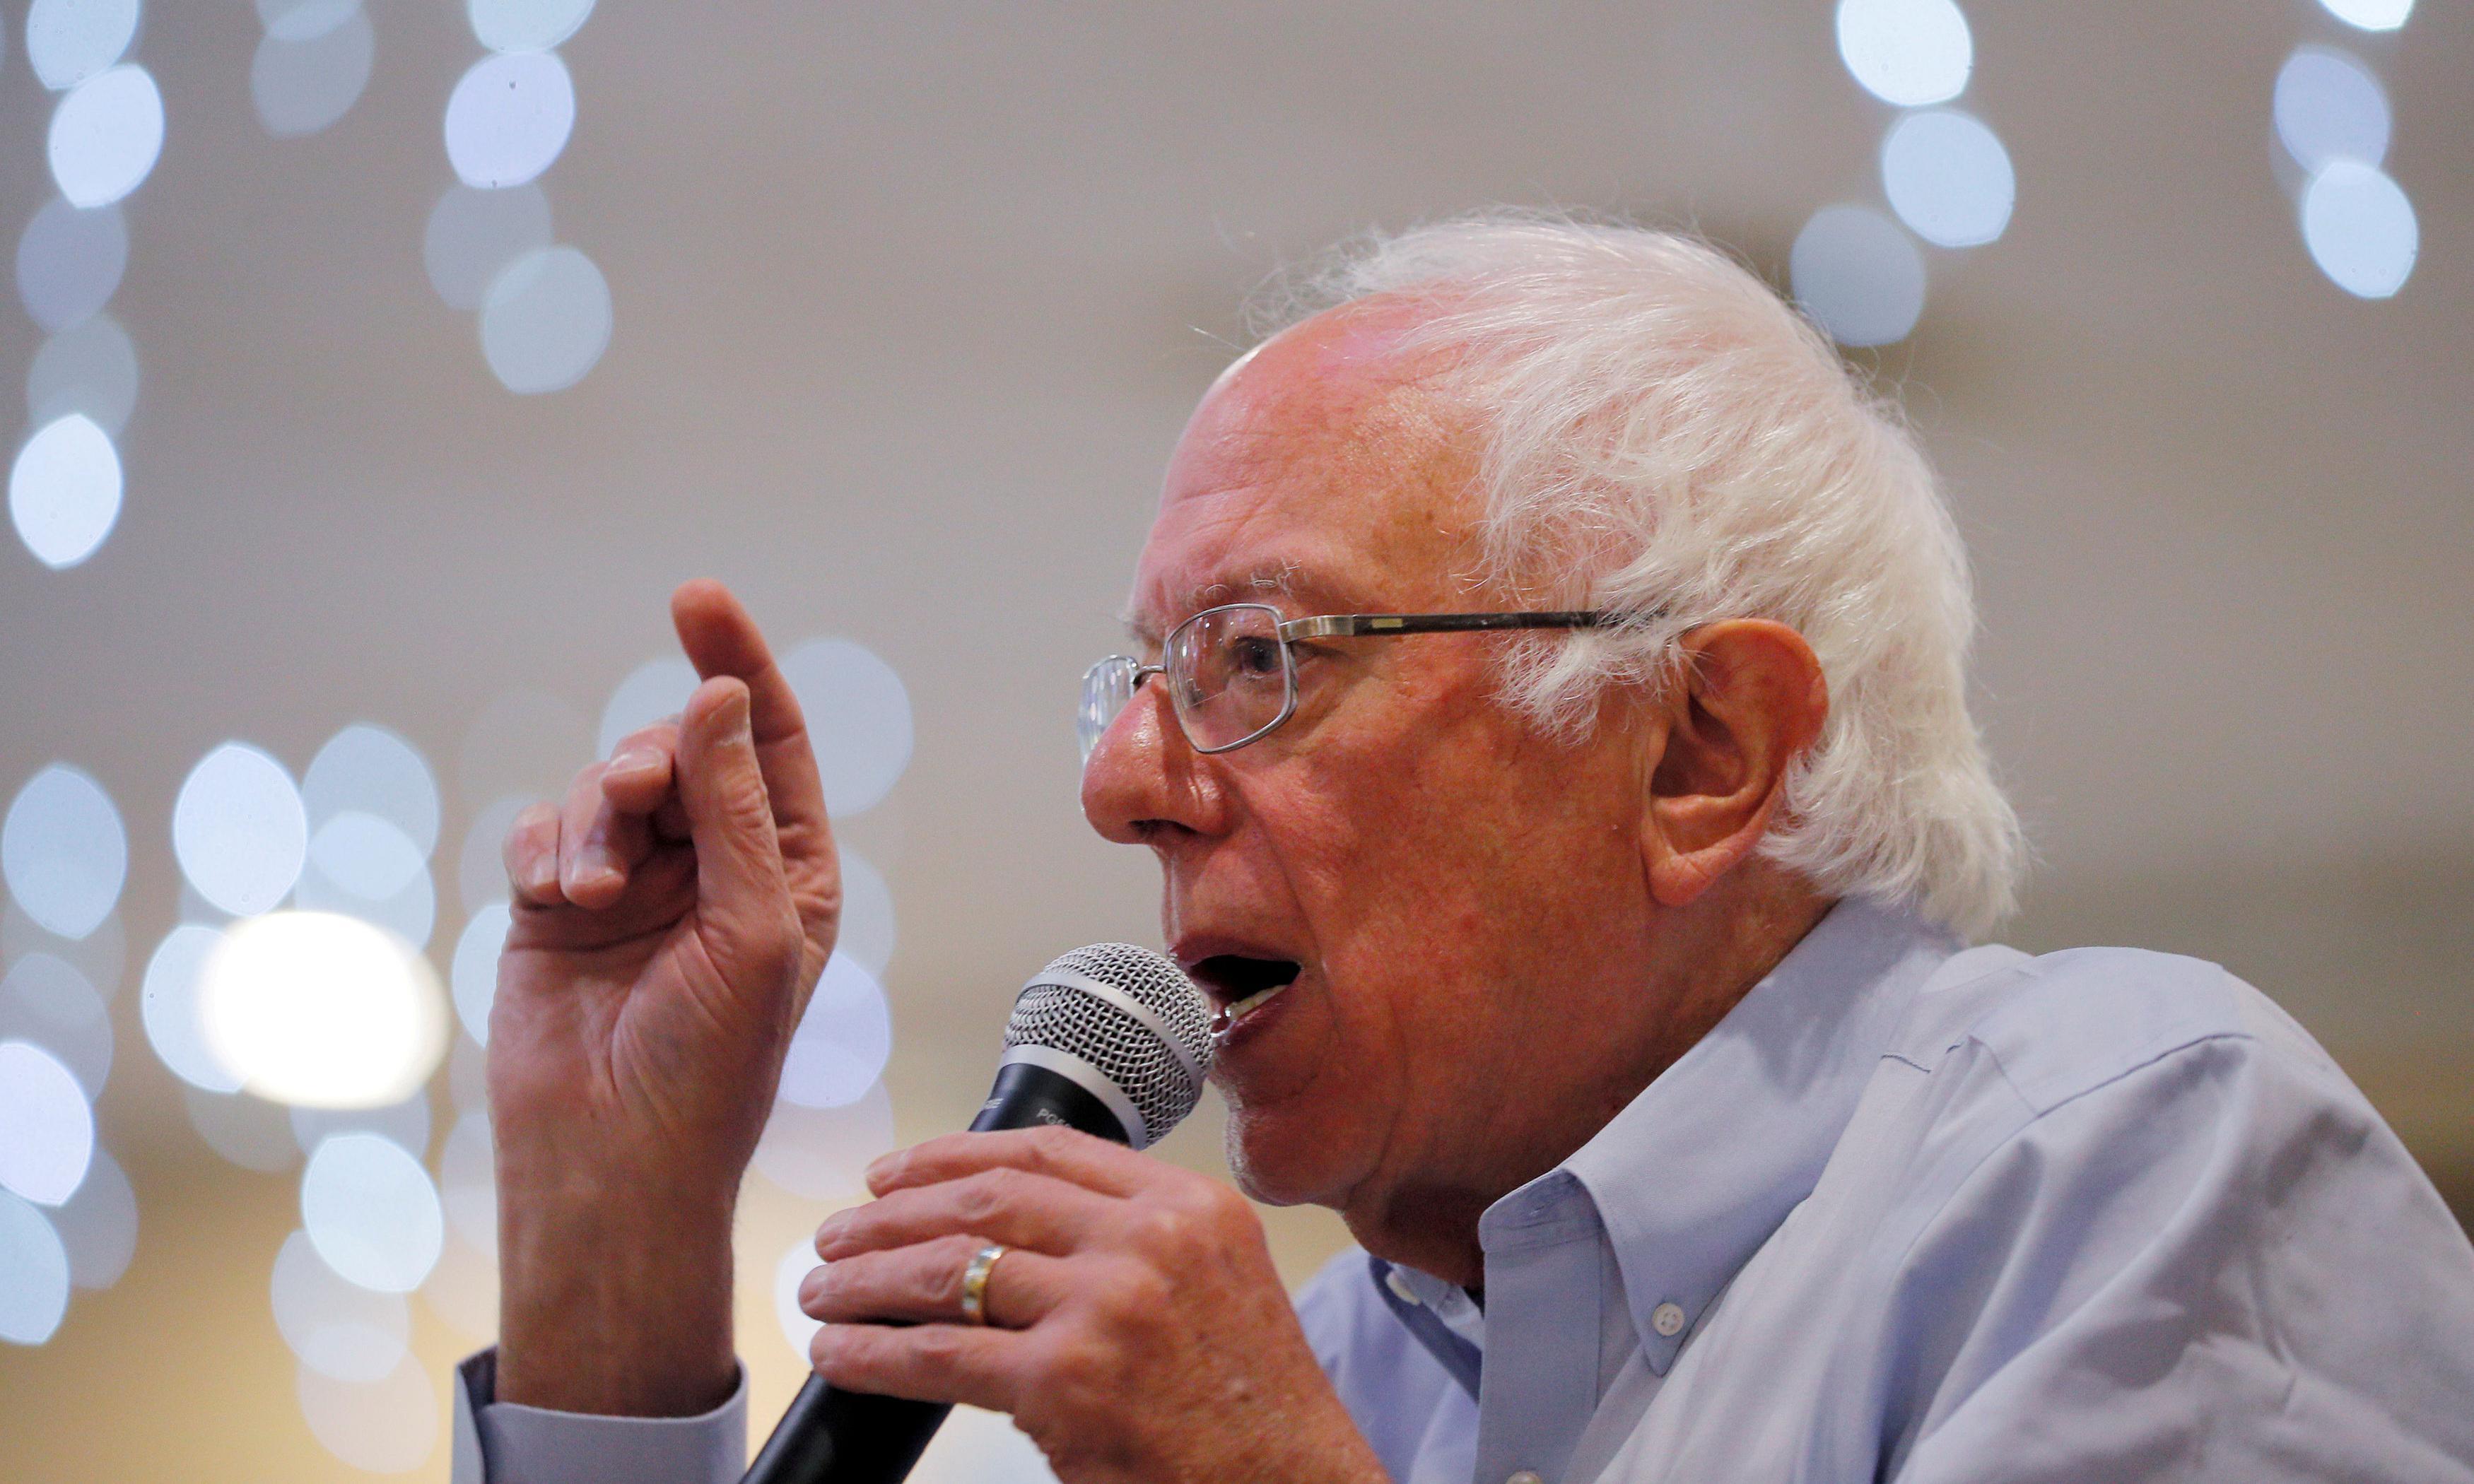 Bernie Sanders says he has no plans to slow down campaign: 'I misspoke'